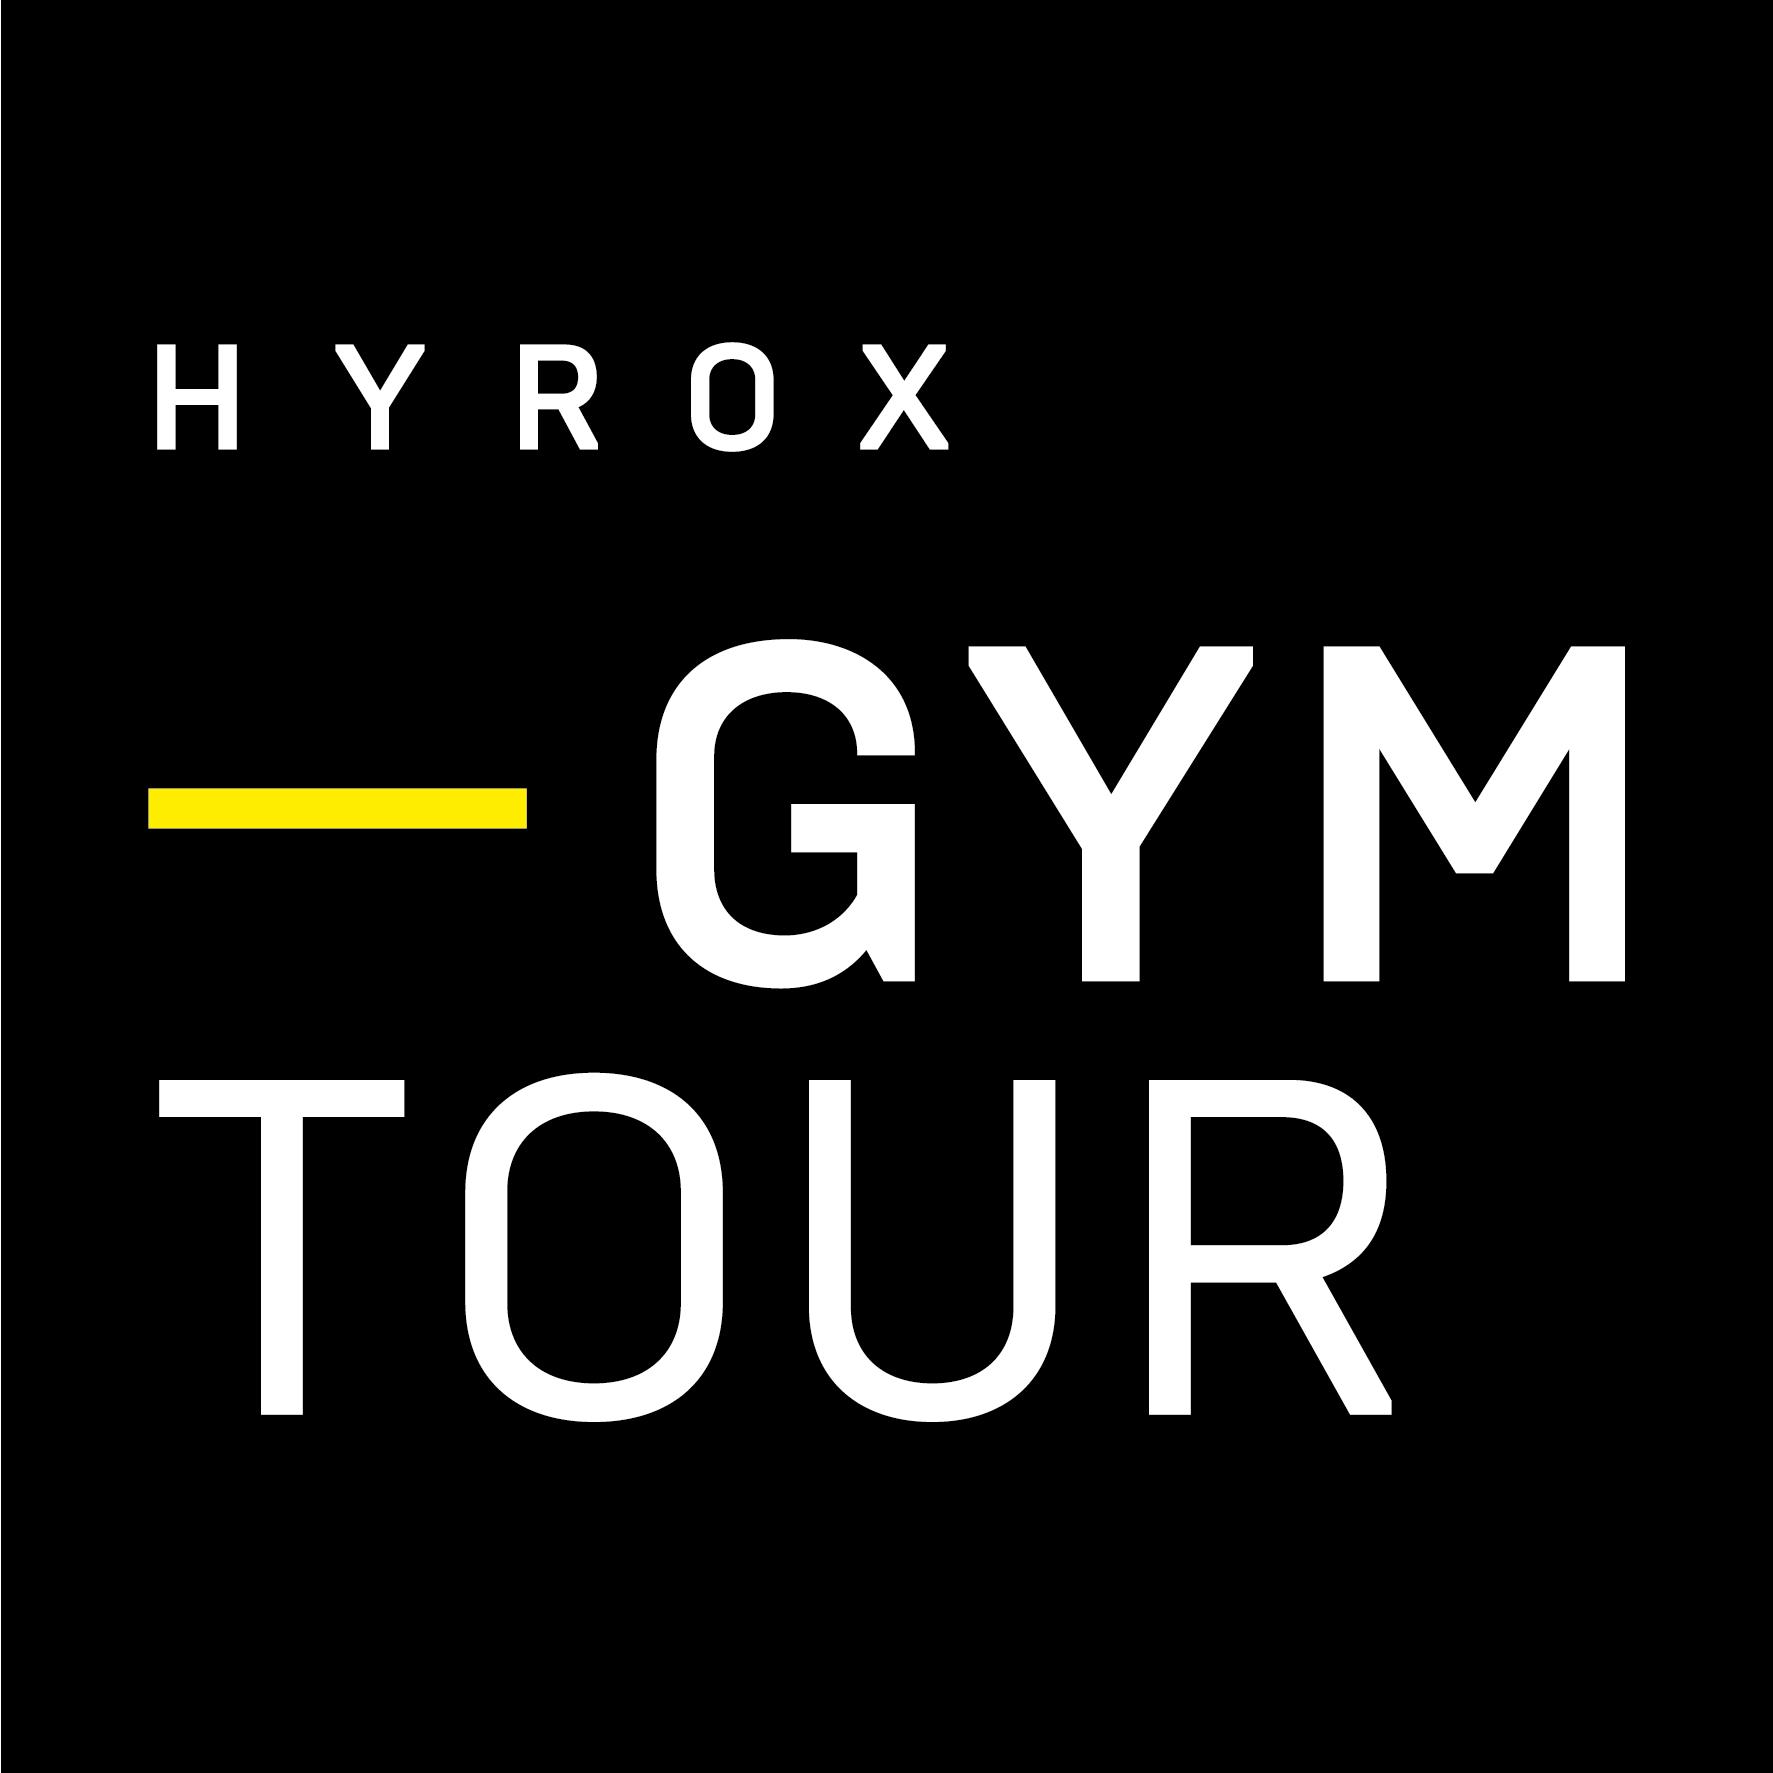 HYROX Gym Tour - London